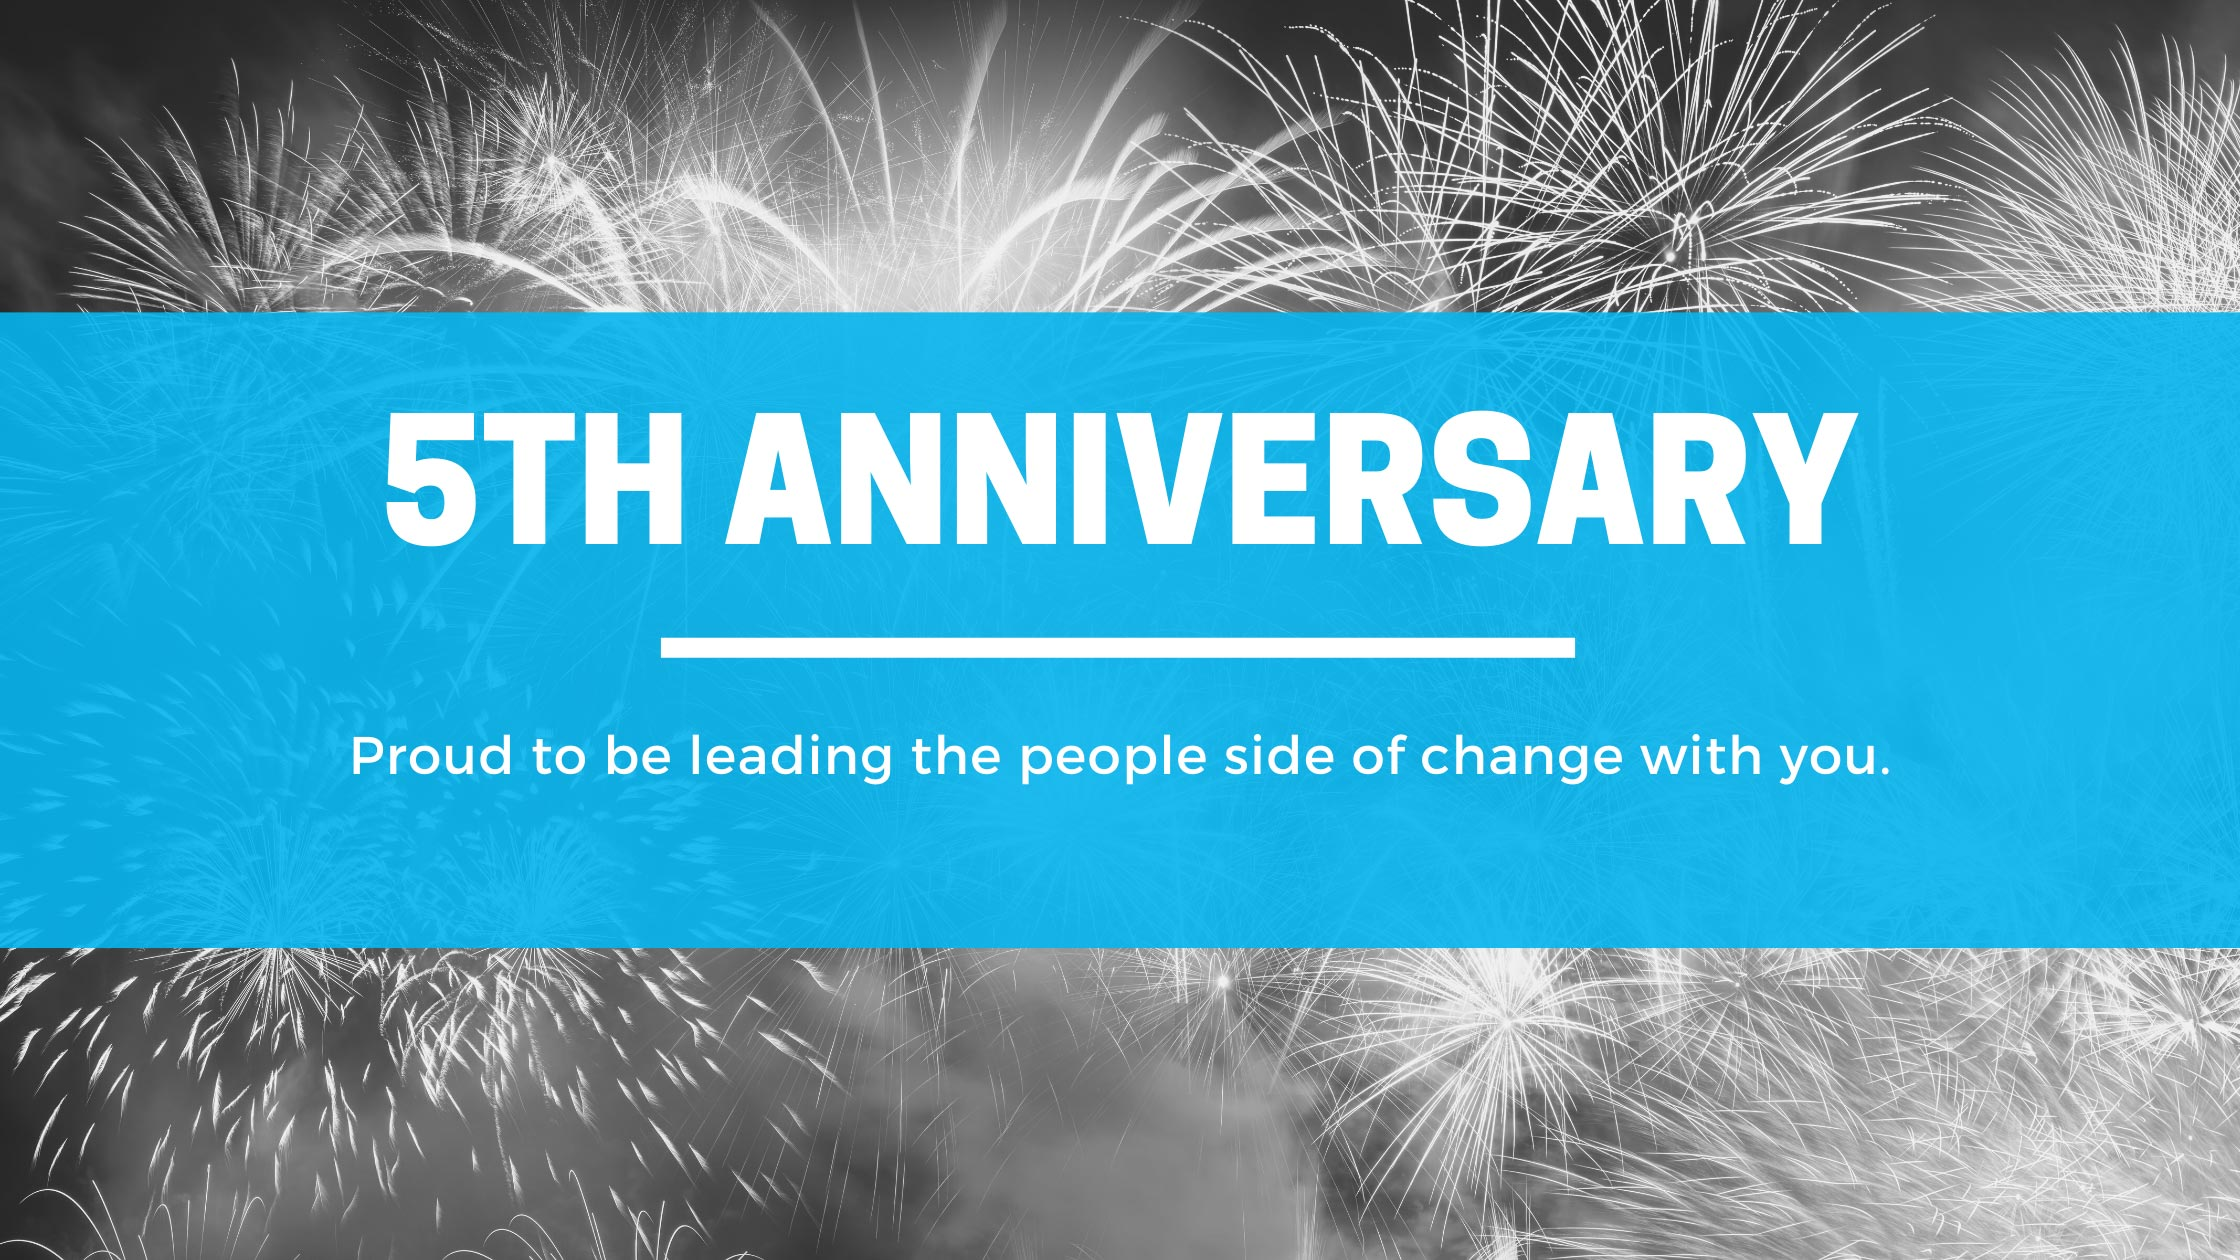 Celebrating our 5th Anniversary in Australia